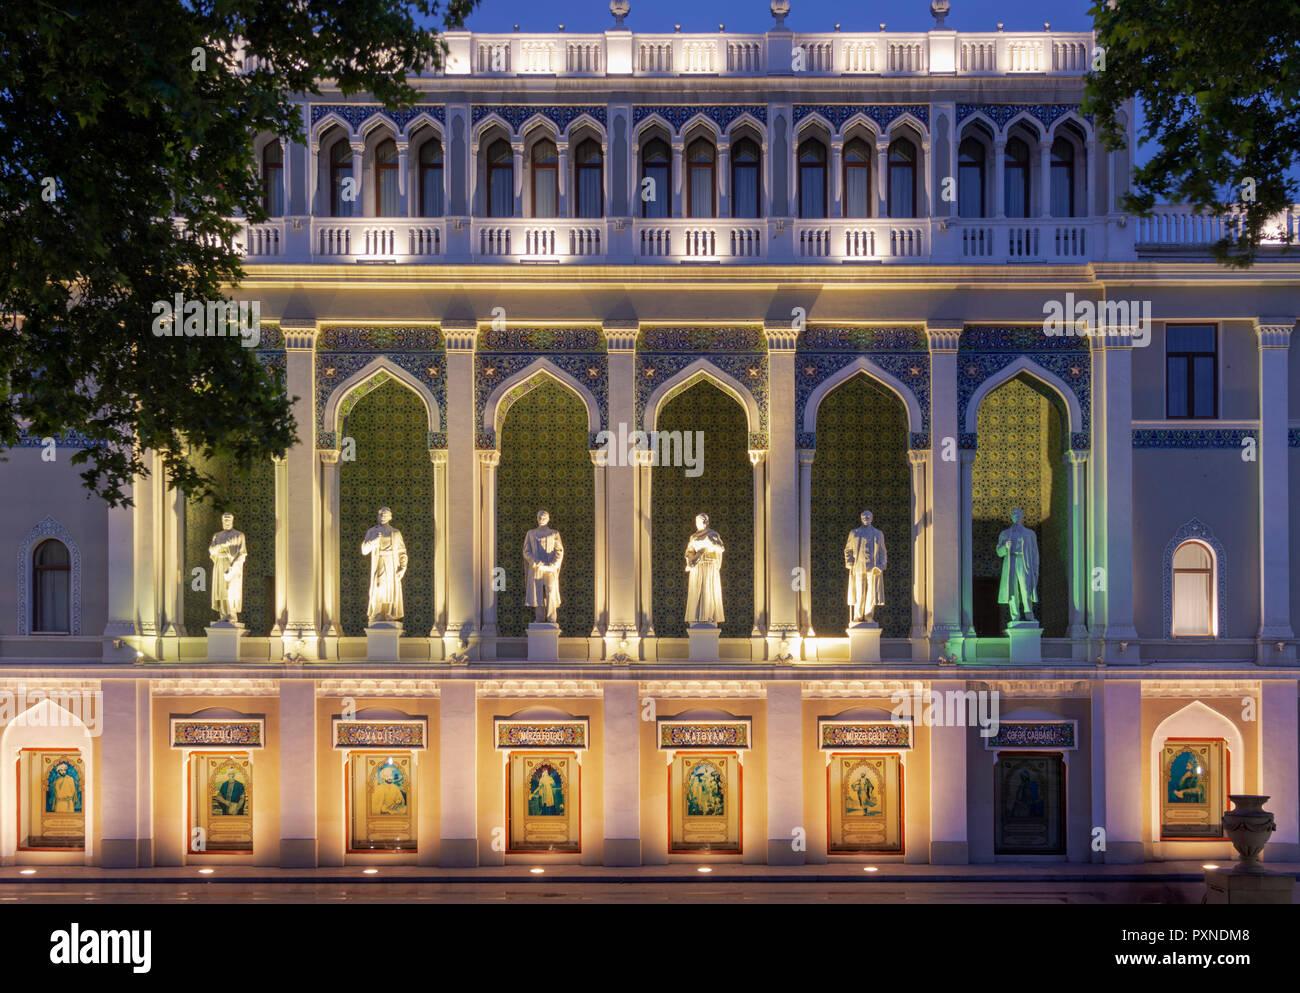 The Nizami Museum of Azerbaijani Literature in Baku, named after the great romantic epic poet Nizami Ganjavi. The statues are of famous Azerbaijani writers. Azerbaijan - Stock Image